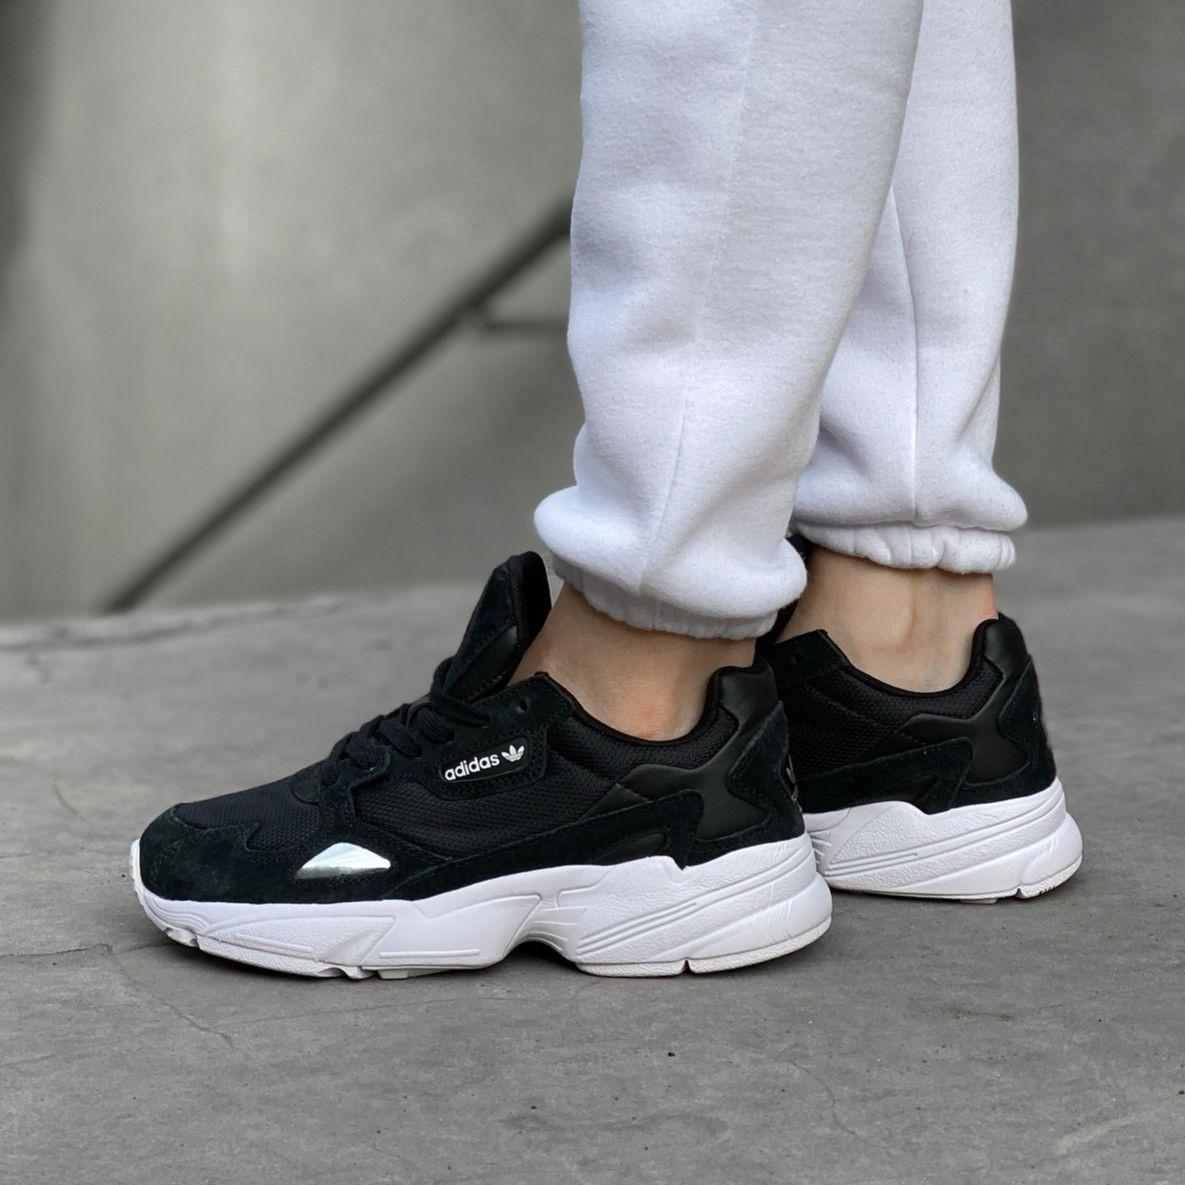 Женские кроссовки в стиле Adidas Falcon Black/White